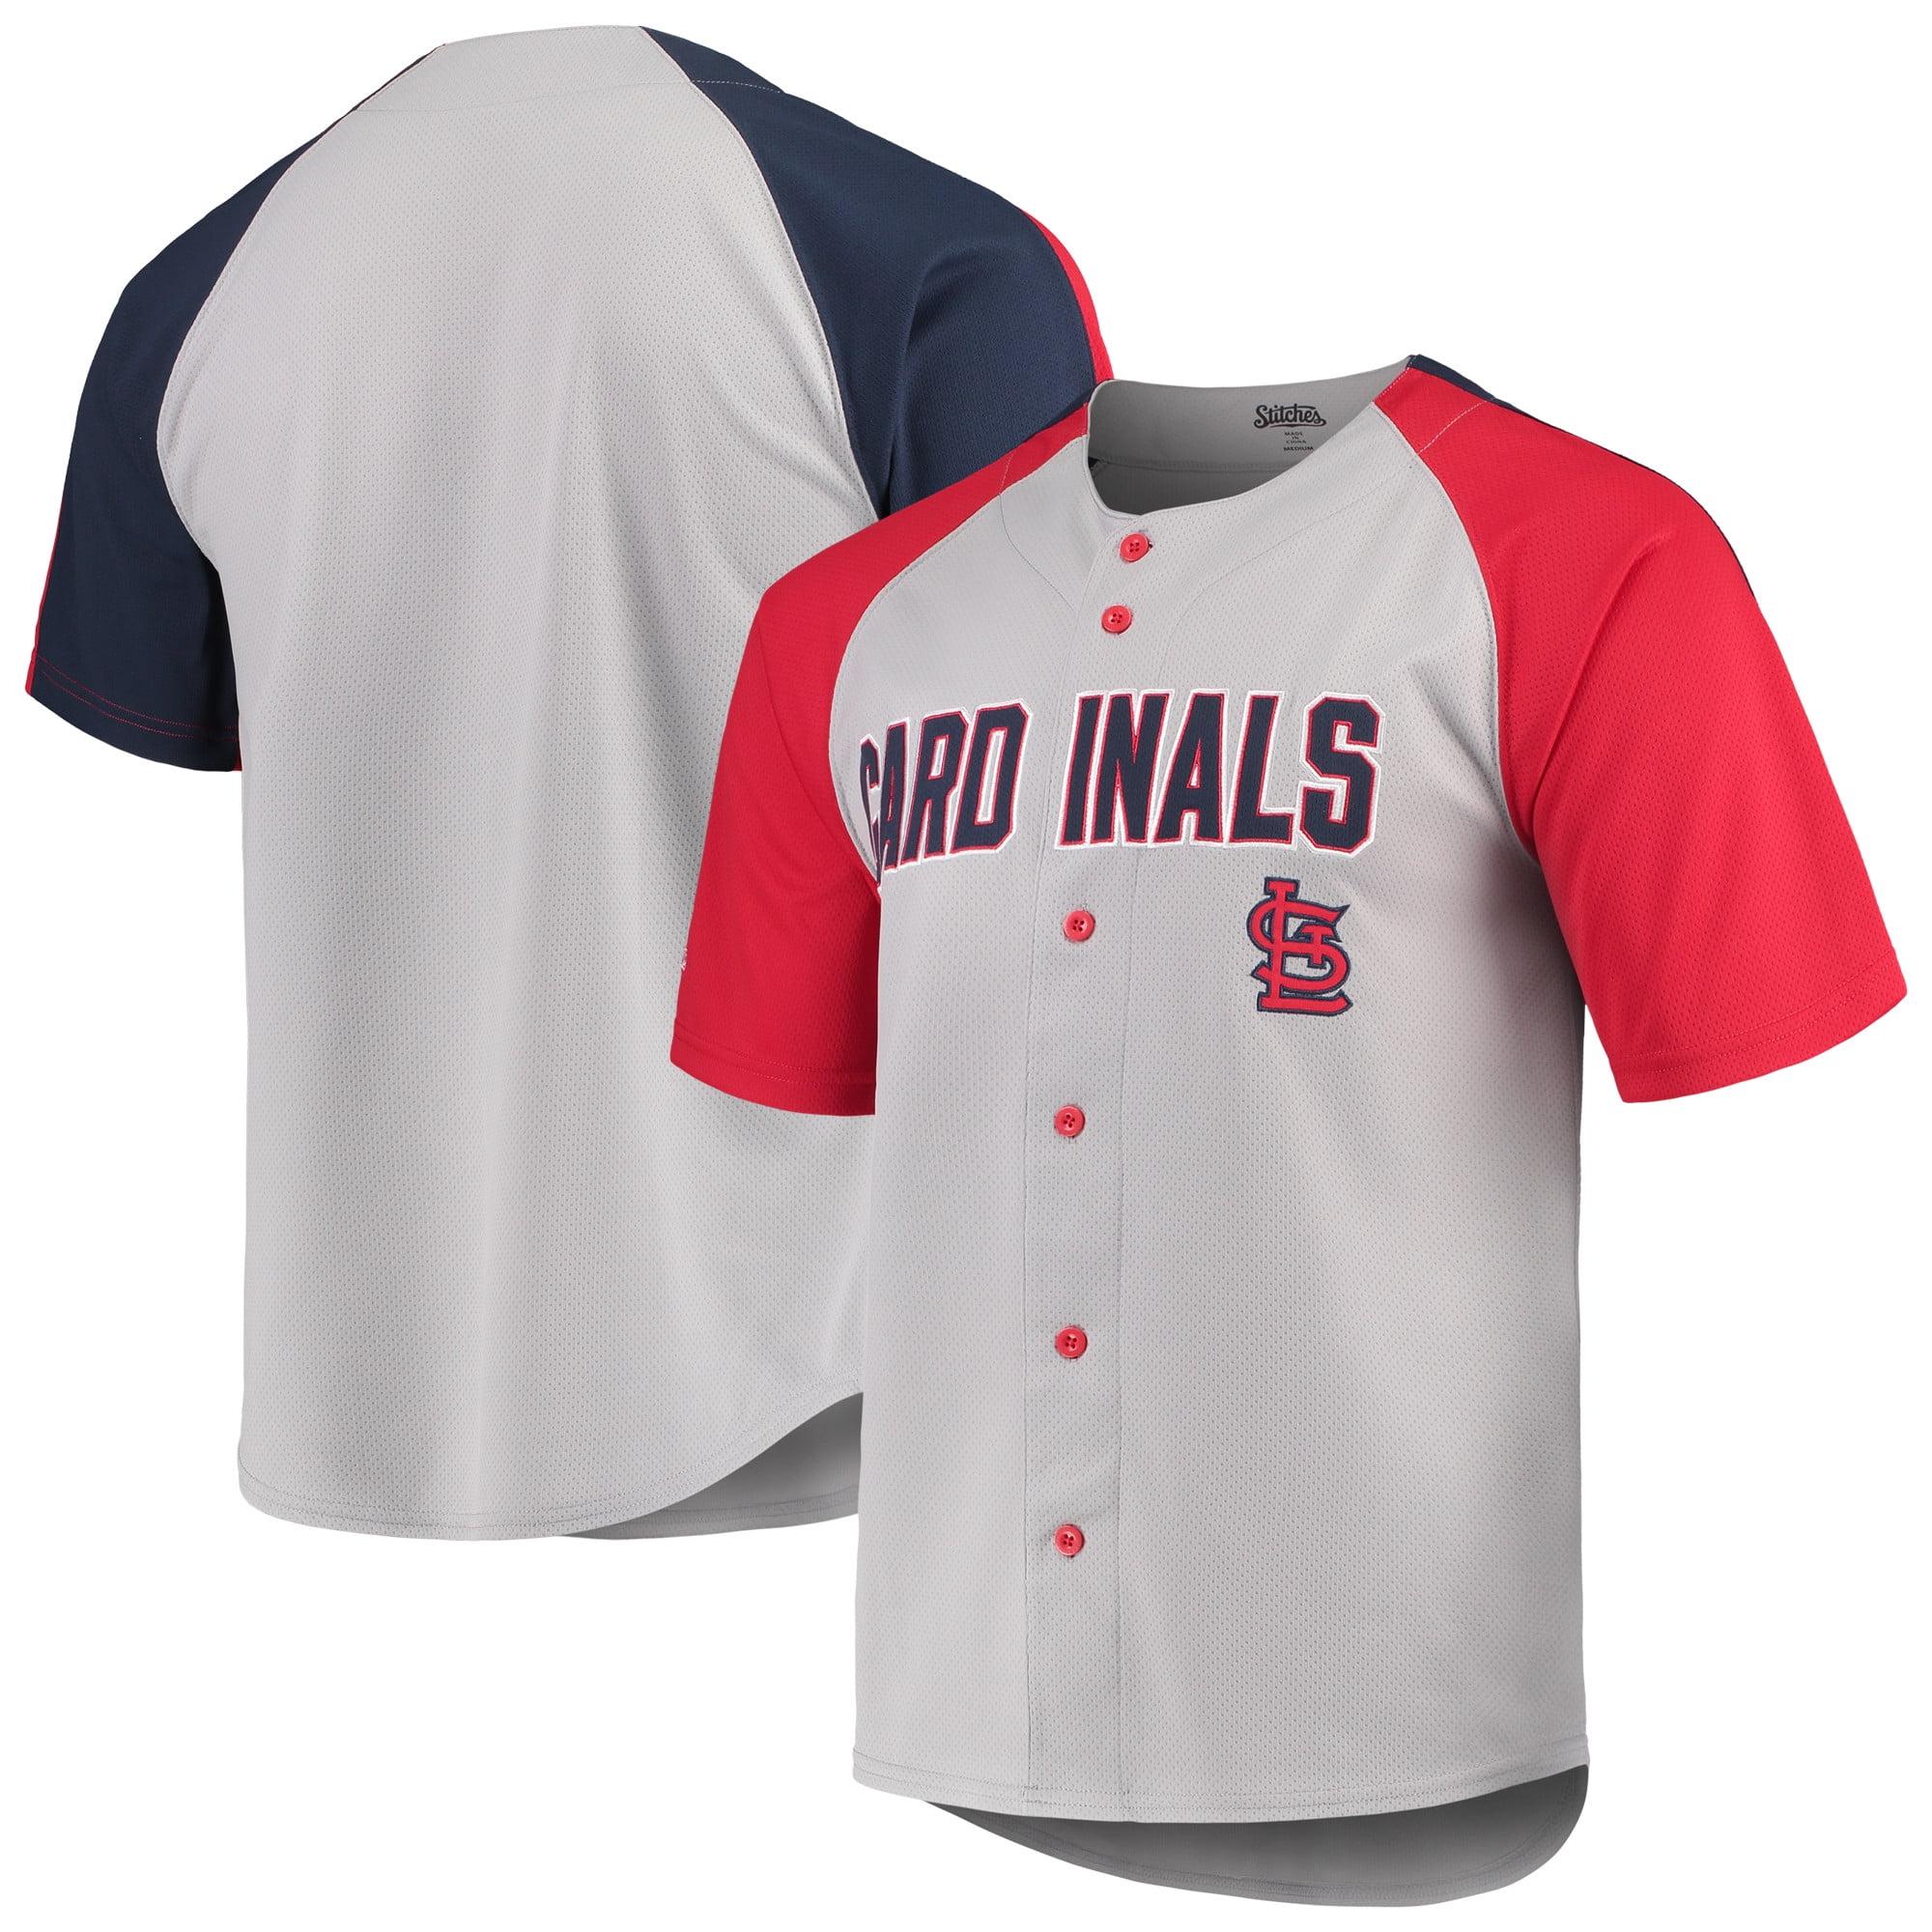 St. Louis Cardinals Stitches Lightweight Mesh Jersey - Gray/Red